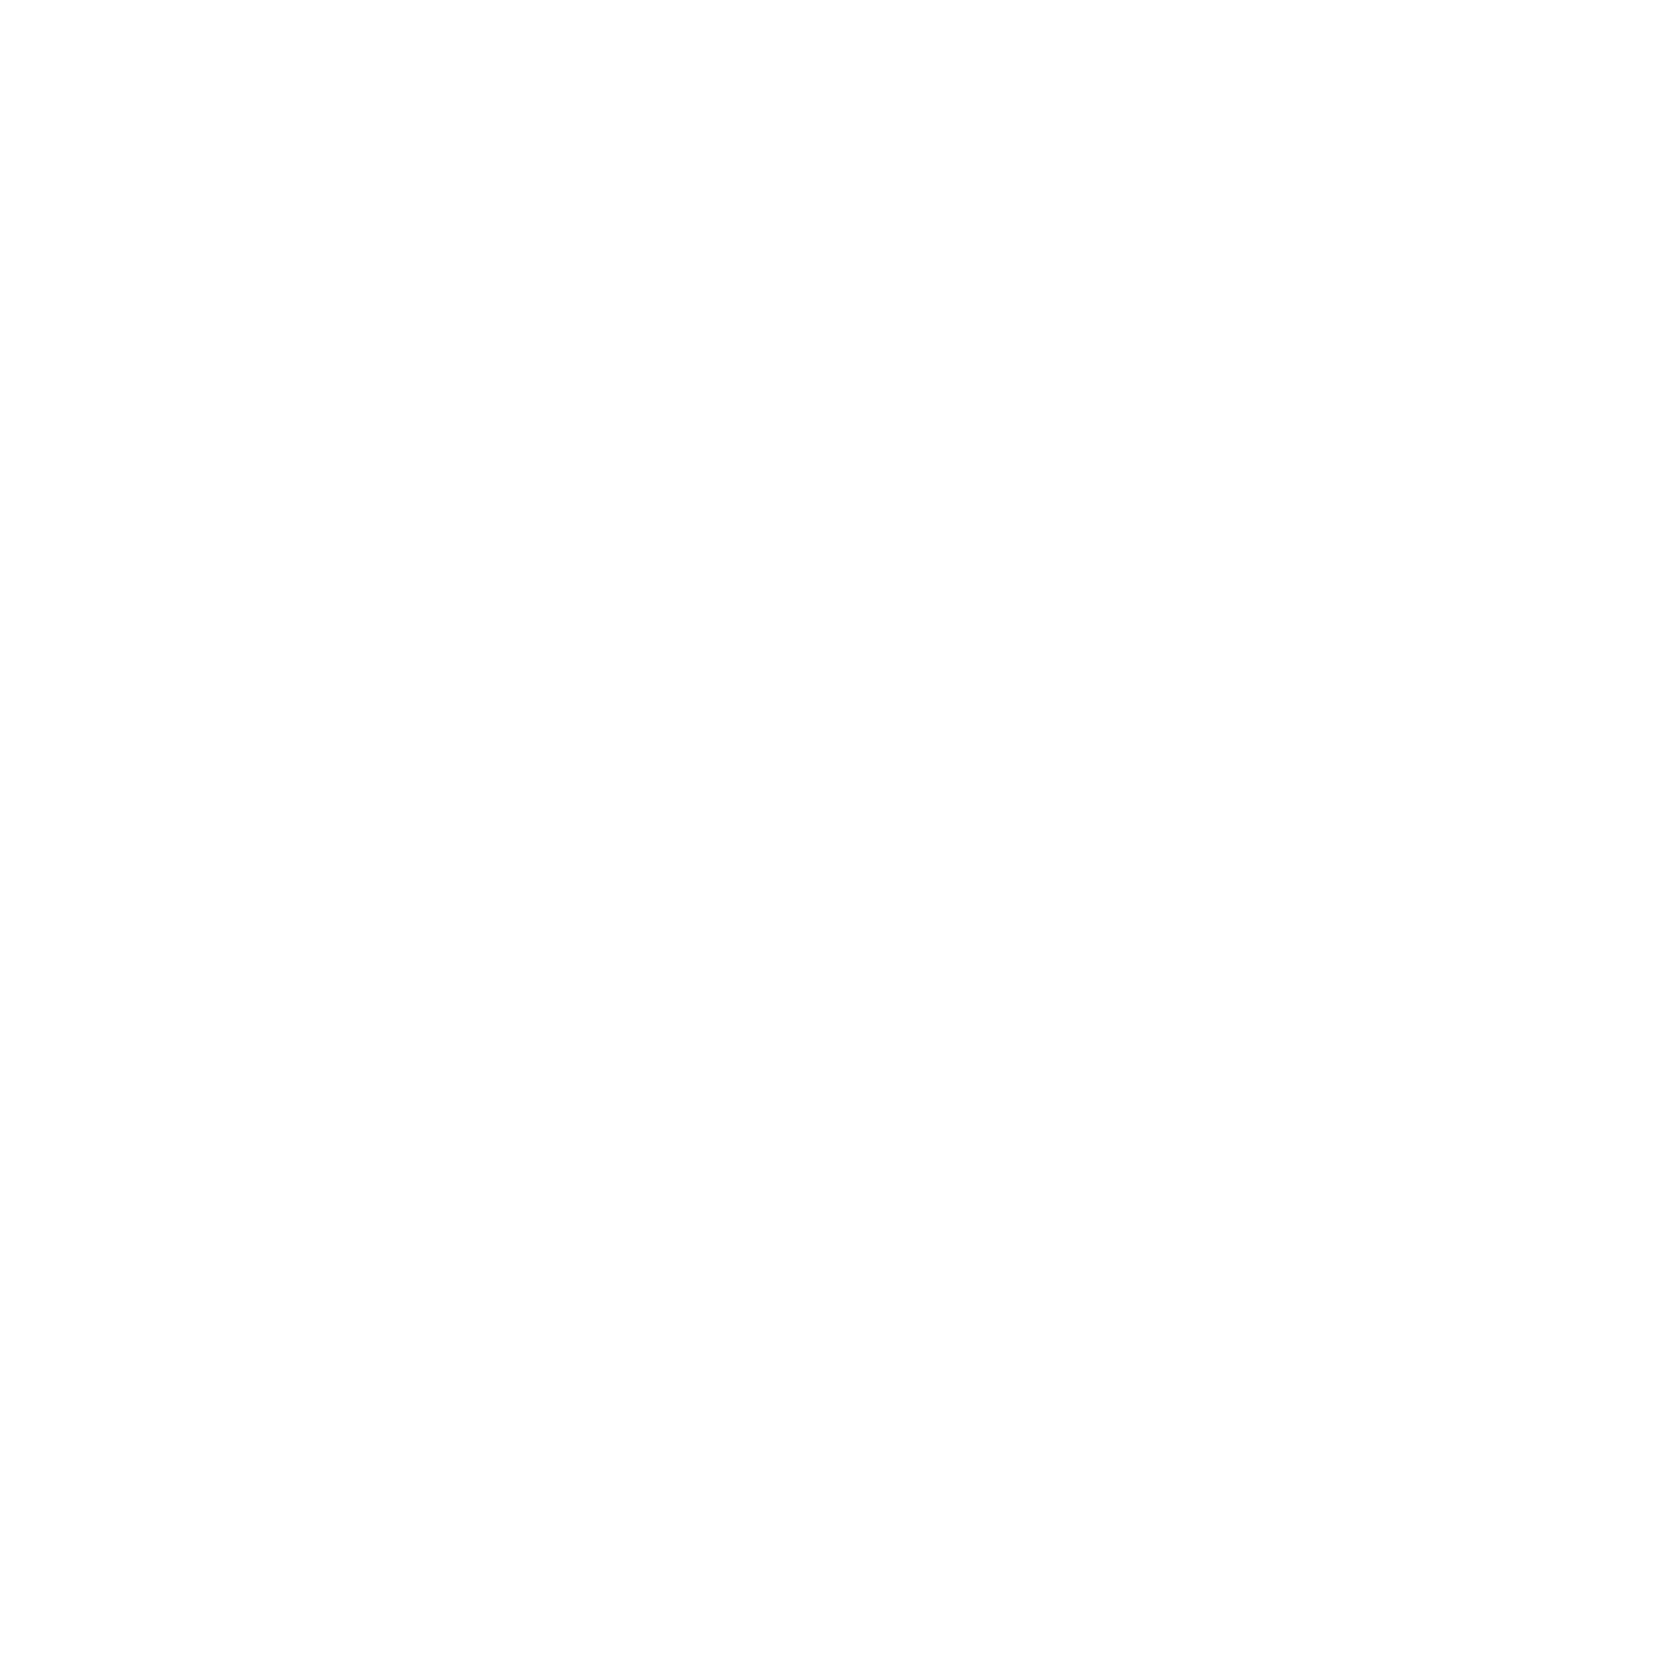 Oechsle-Work-Tadashi-Matayoshi